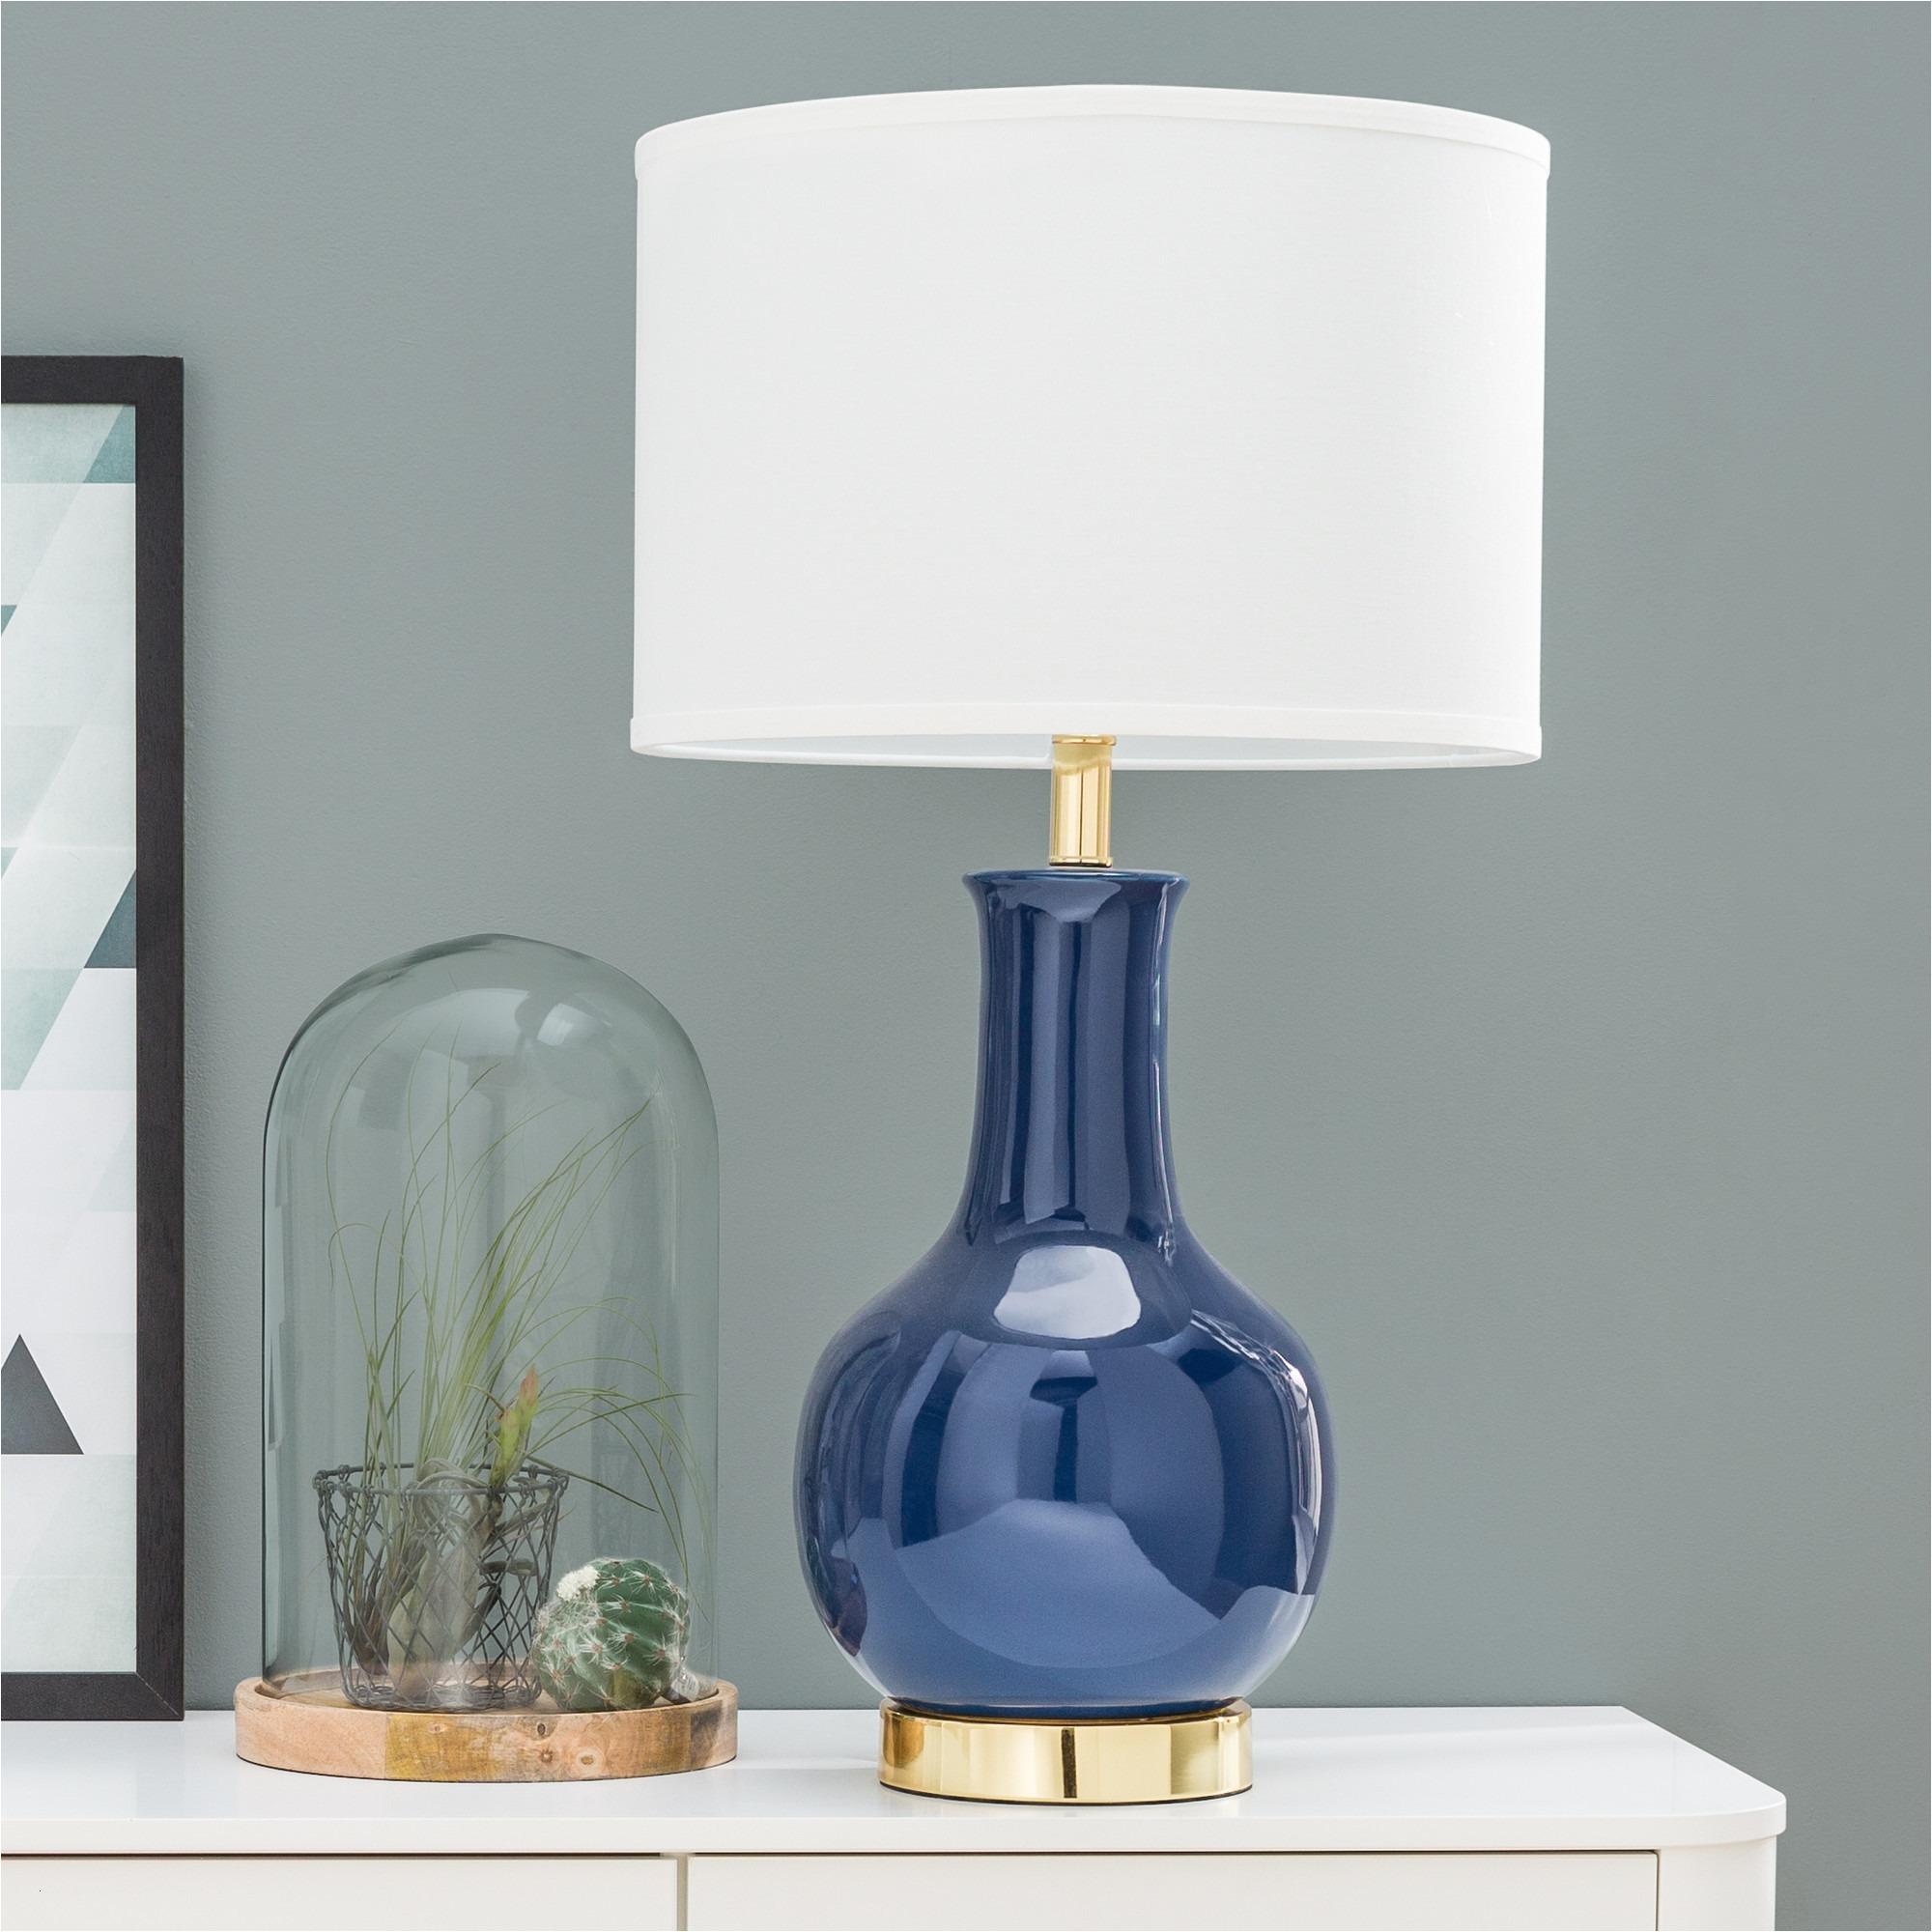 industrial bedroom lighting awesome west elm industrial floor lamp best elegant floor lamps for